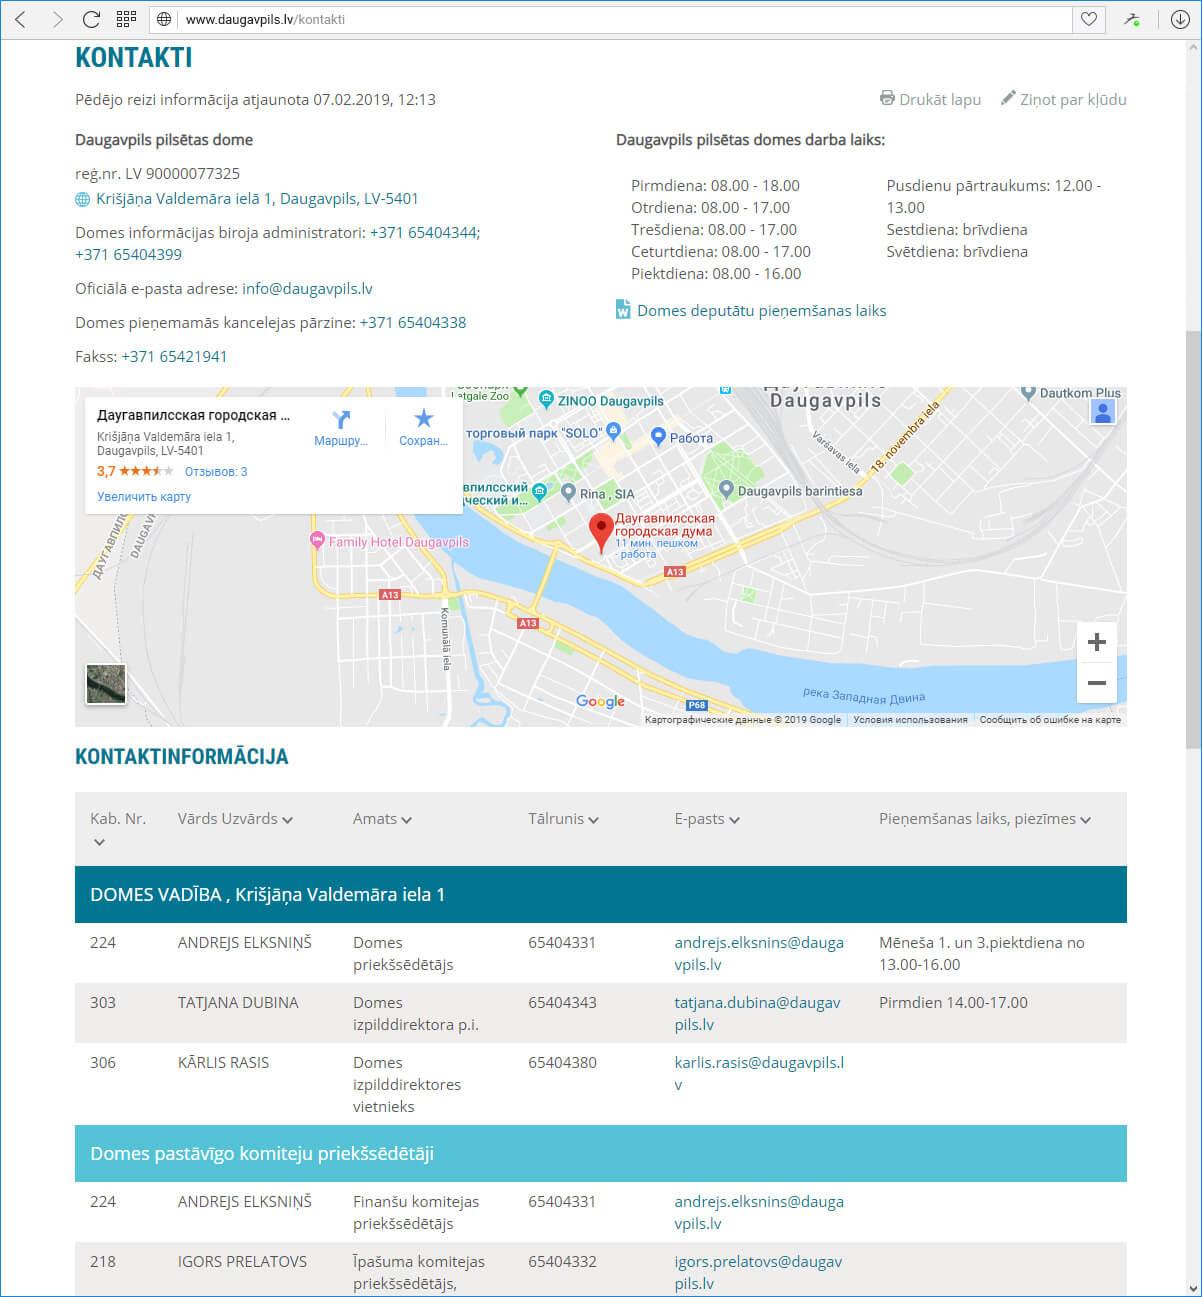 Daugavpils pilsētas domes mājas lapa Daugavpils.lv - kontakti